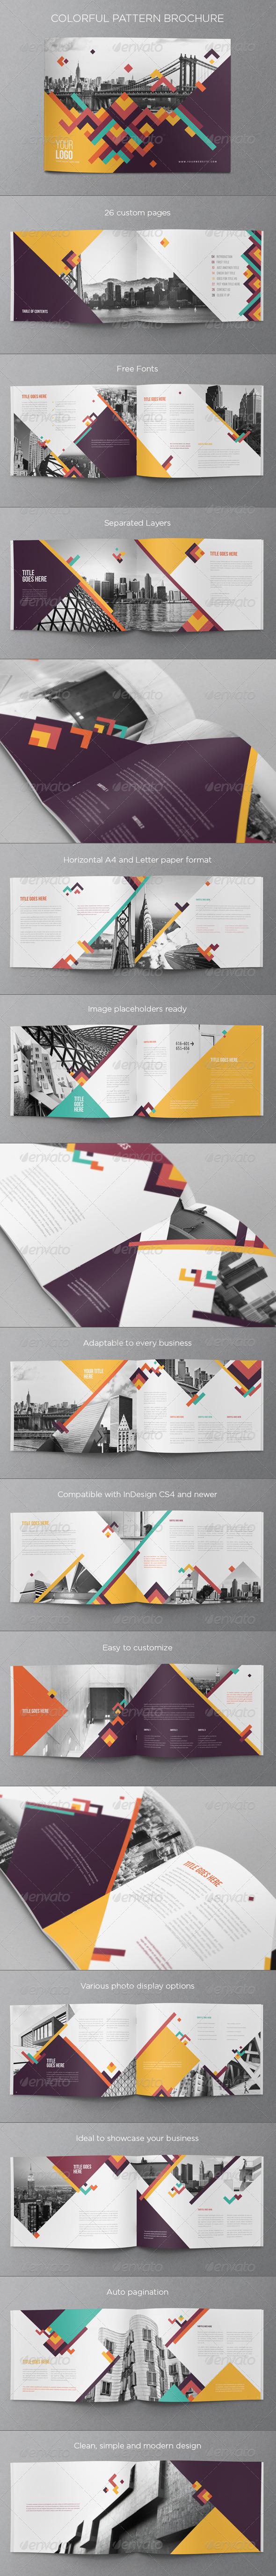 GraphicRiver Colorful Pattern Brochure 7999677